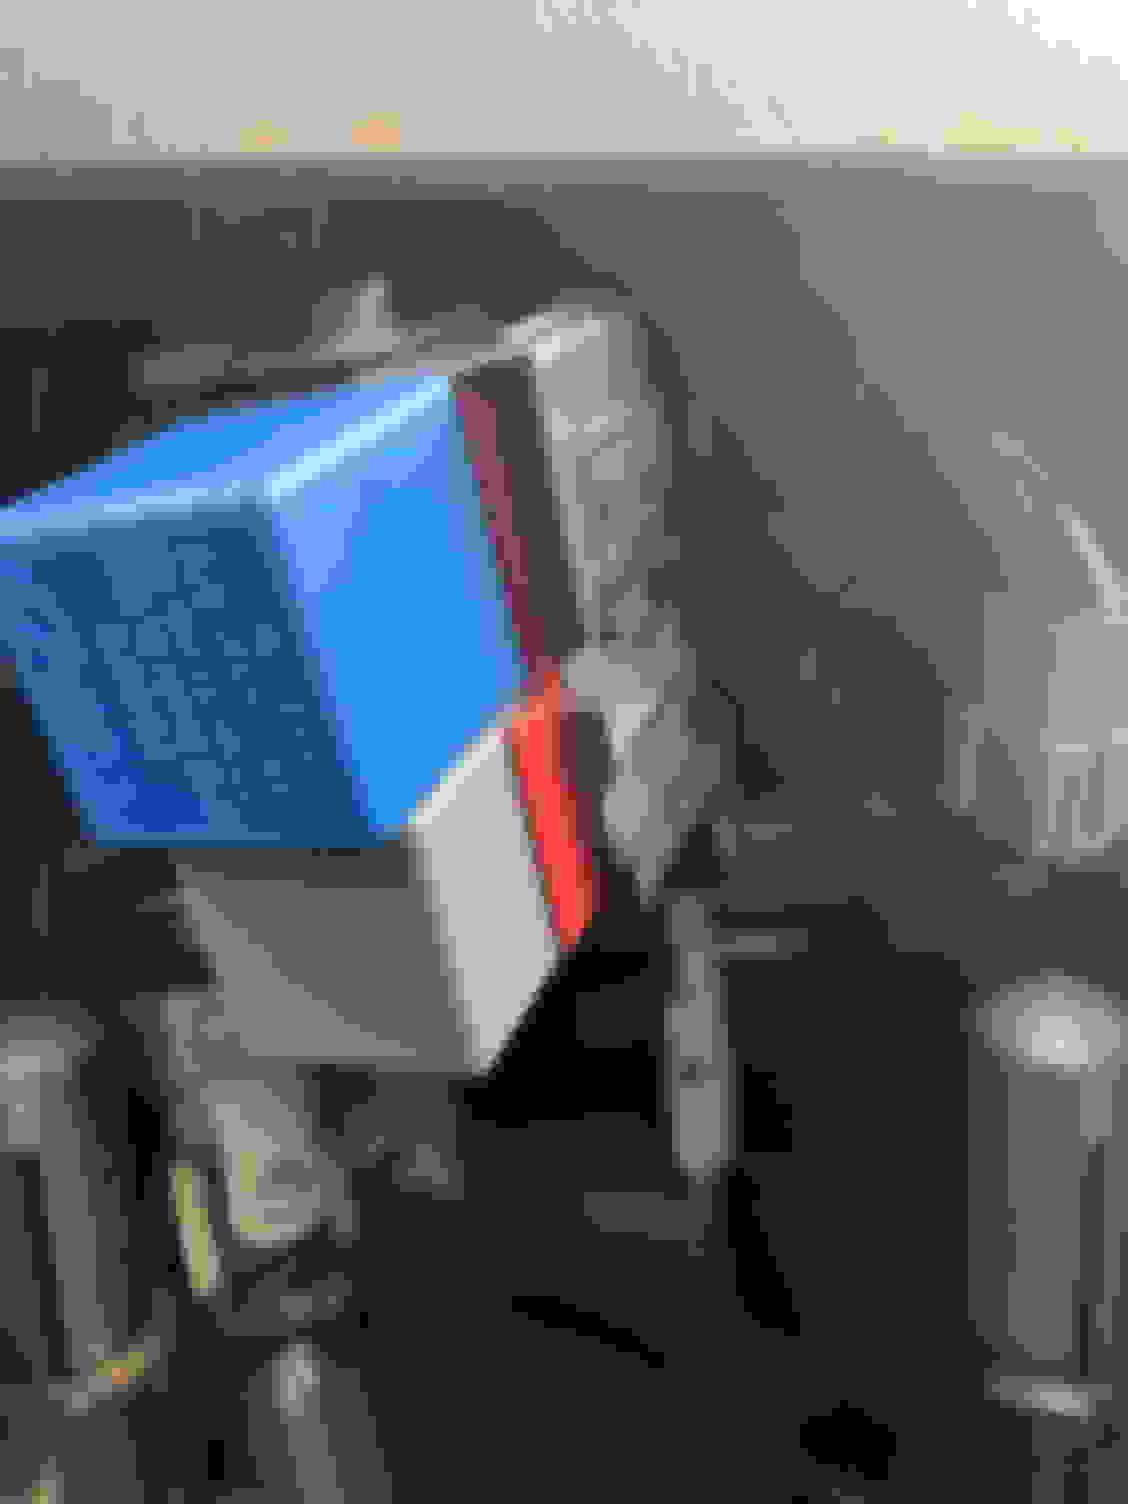 F150 Fuse Locations 2000 F150 Relay Diagram 2000 F150 Fuse Box